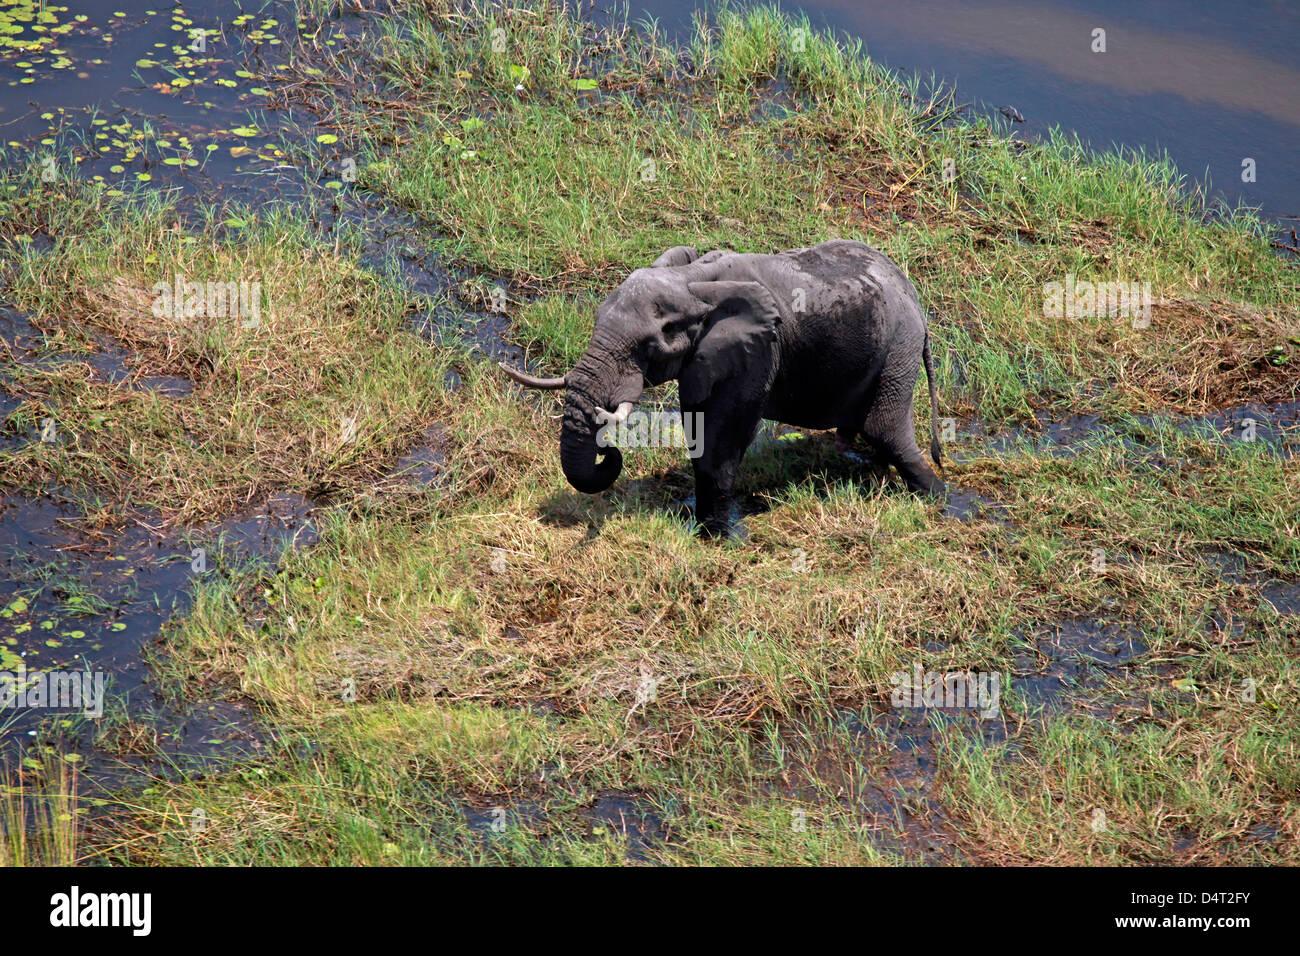 Botswana, Okavango Delta. Aerial view by helicopter safari of elephants in the Okavango Delta. - Stock Image